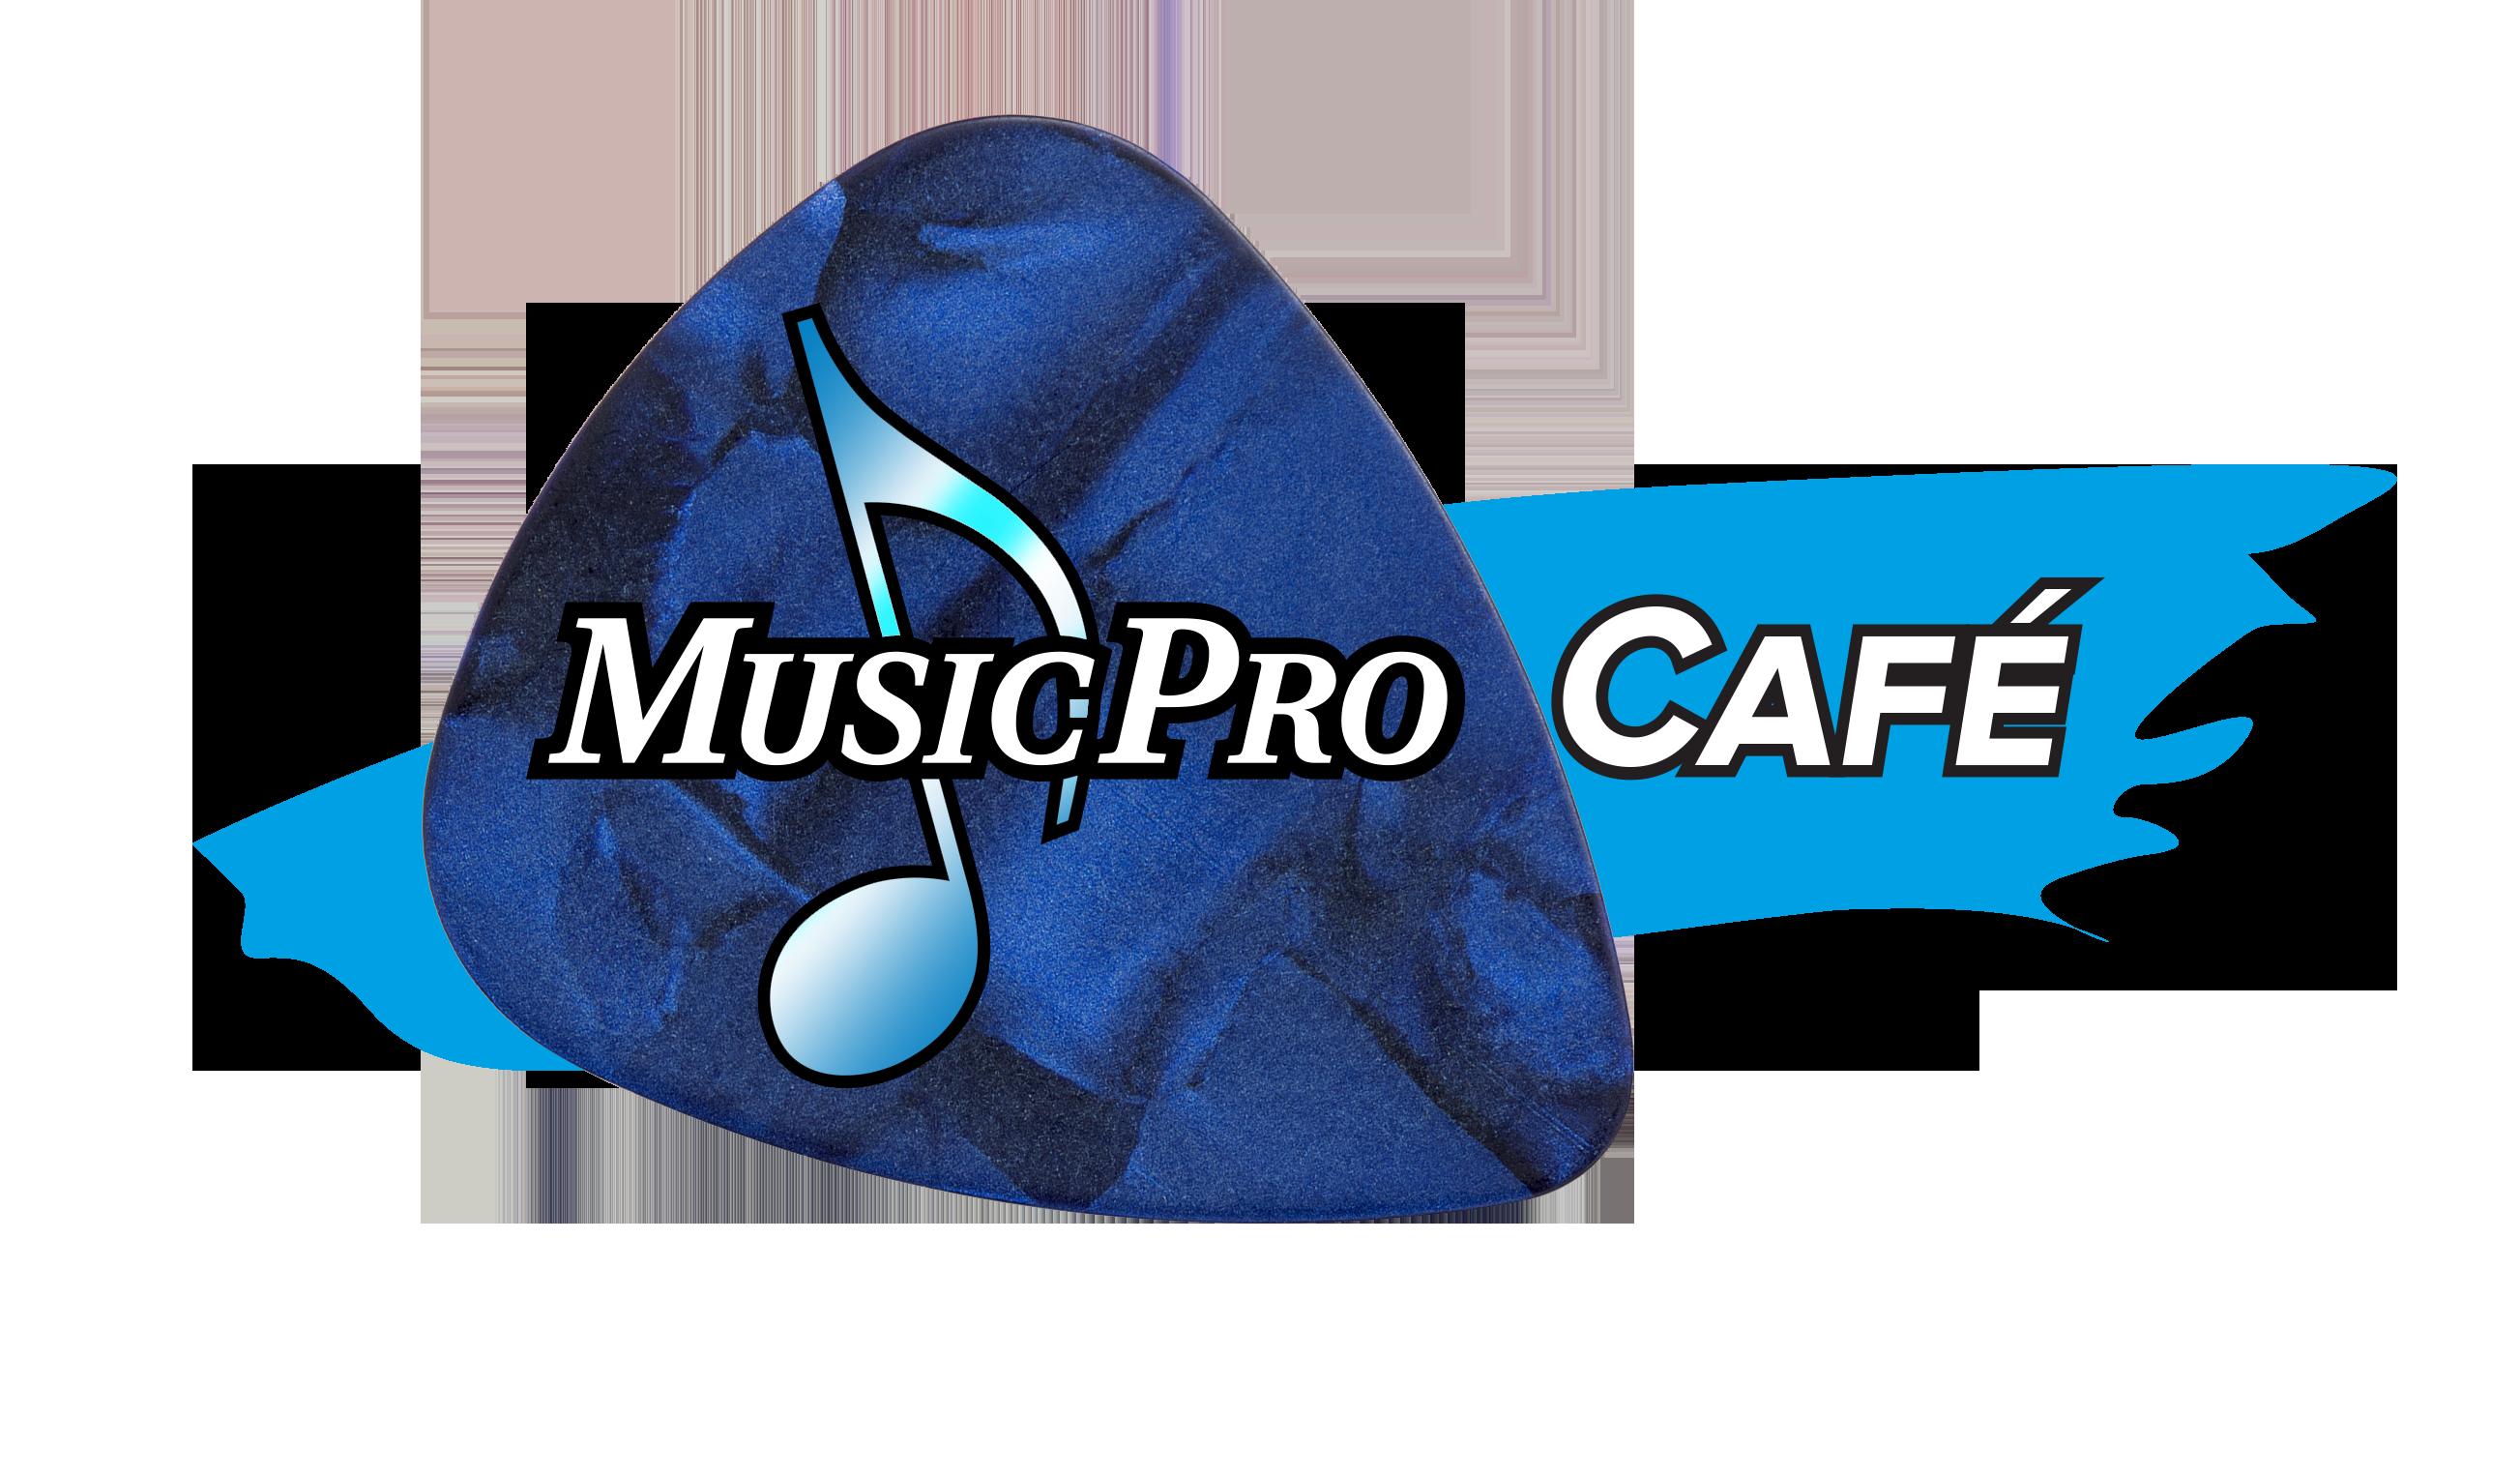 MusicPro Café